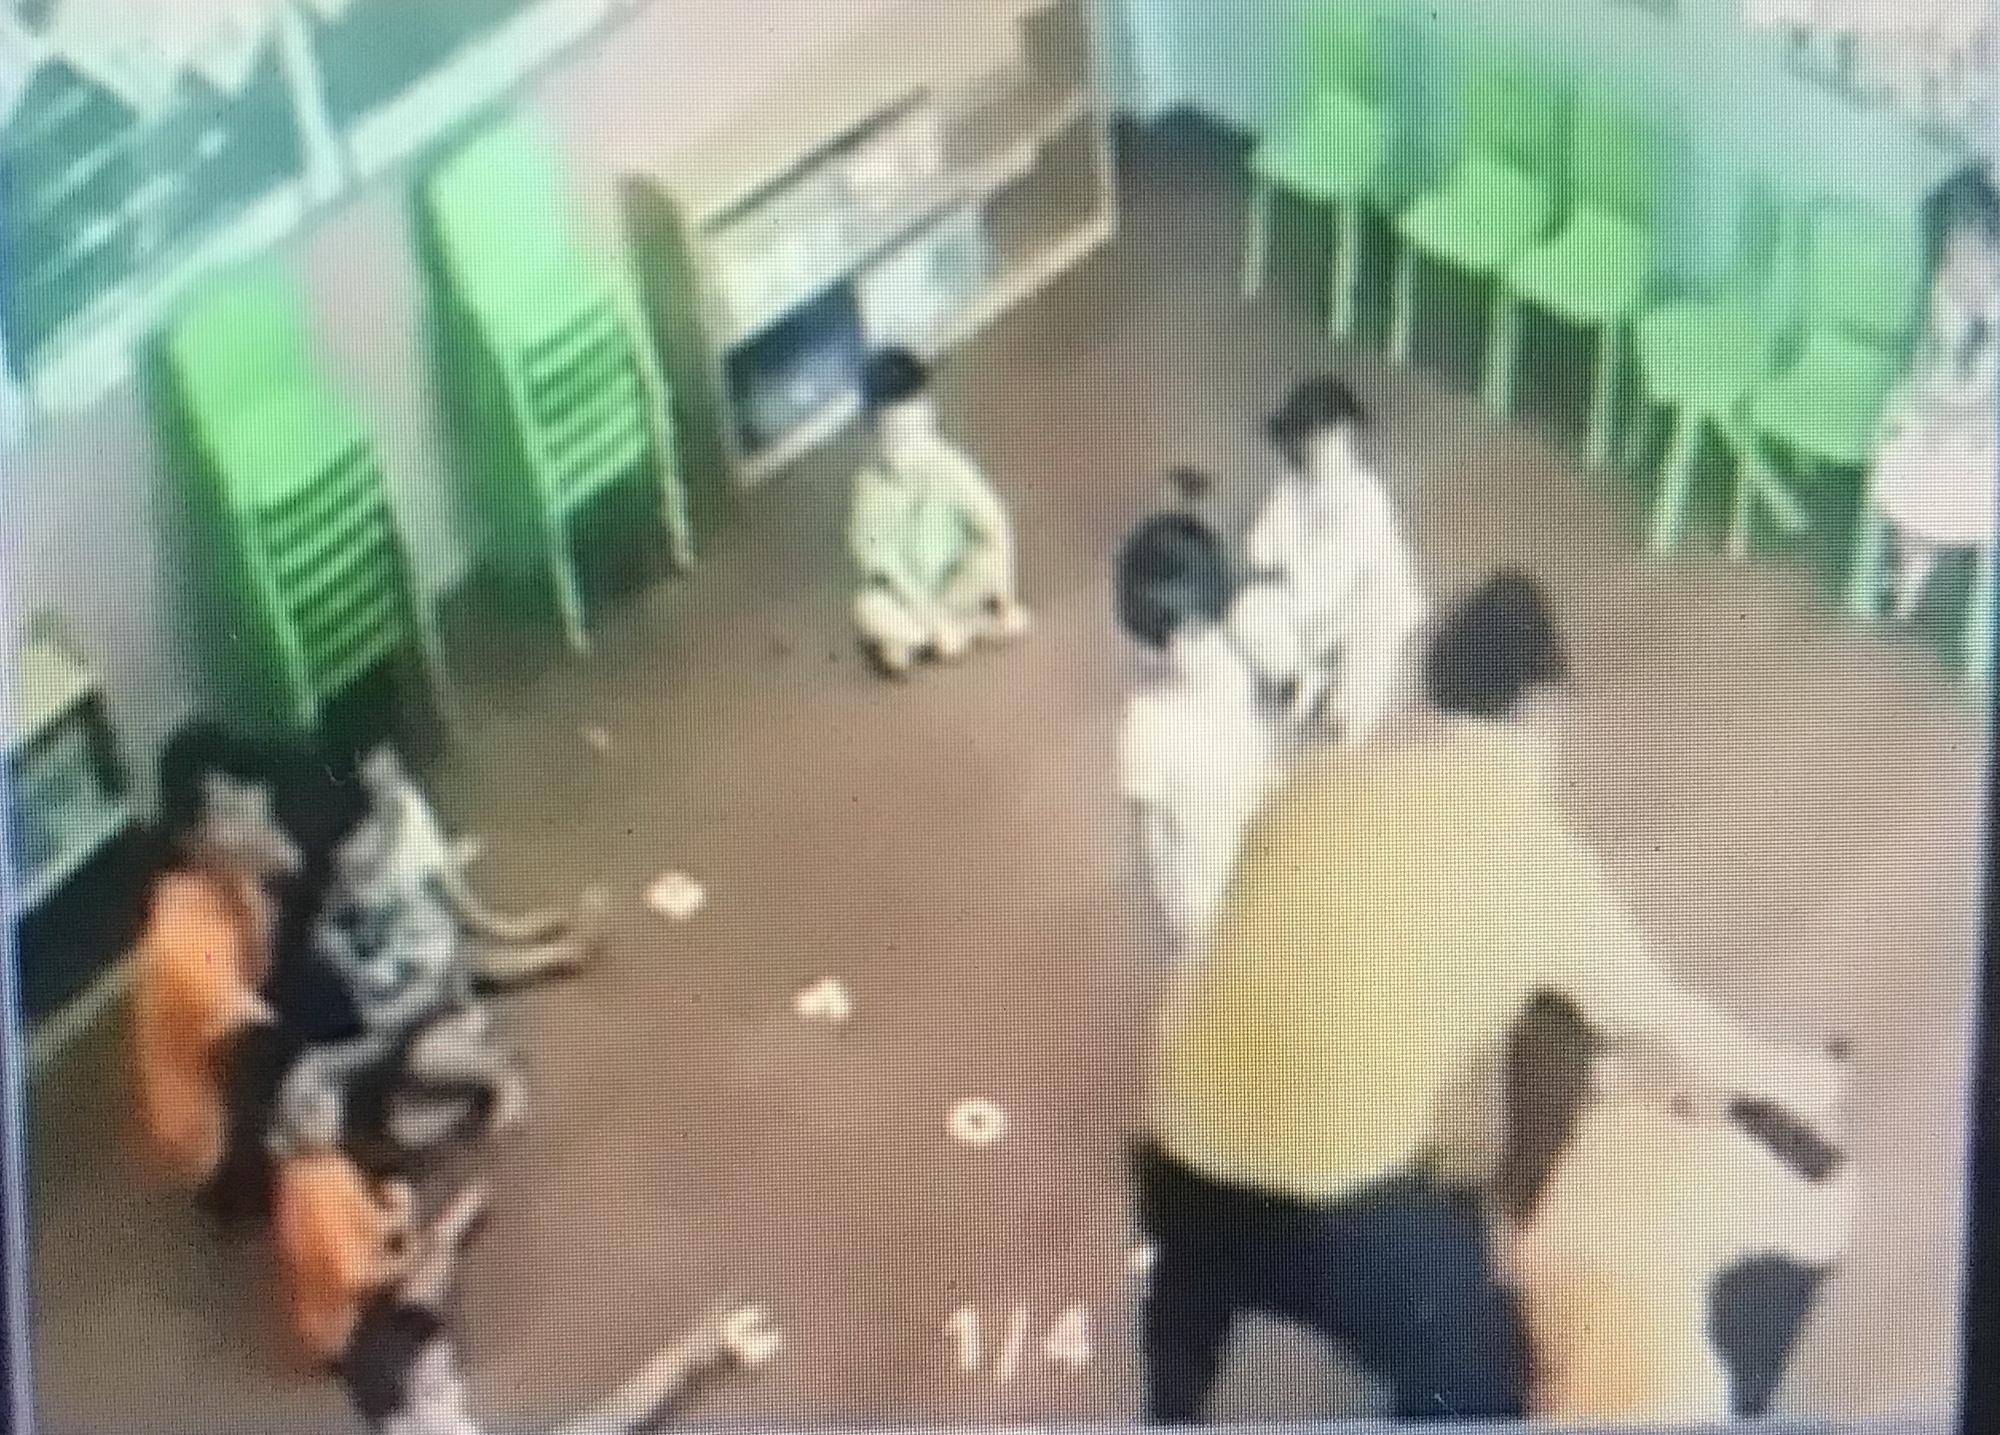 Man filmed hitting 2-year-old girl at kindergarten in Vietnam